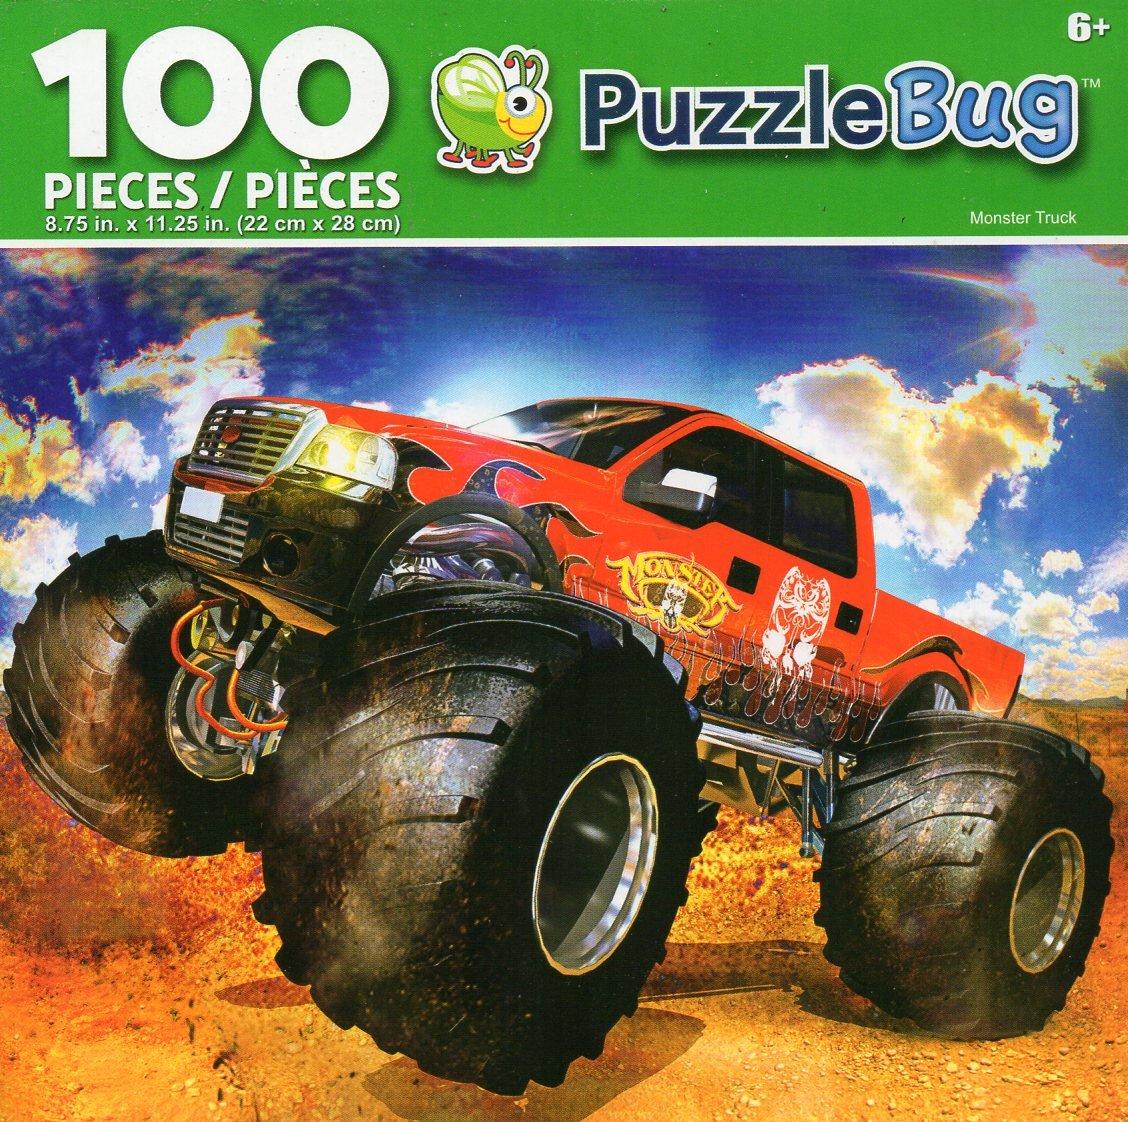 Cra-Z-Art Monster Truck - Puzzlebug - 100 Piece Jigsaw Puzzle